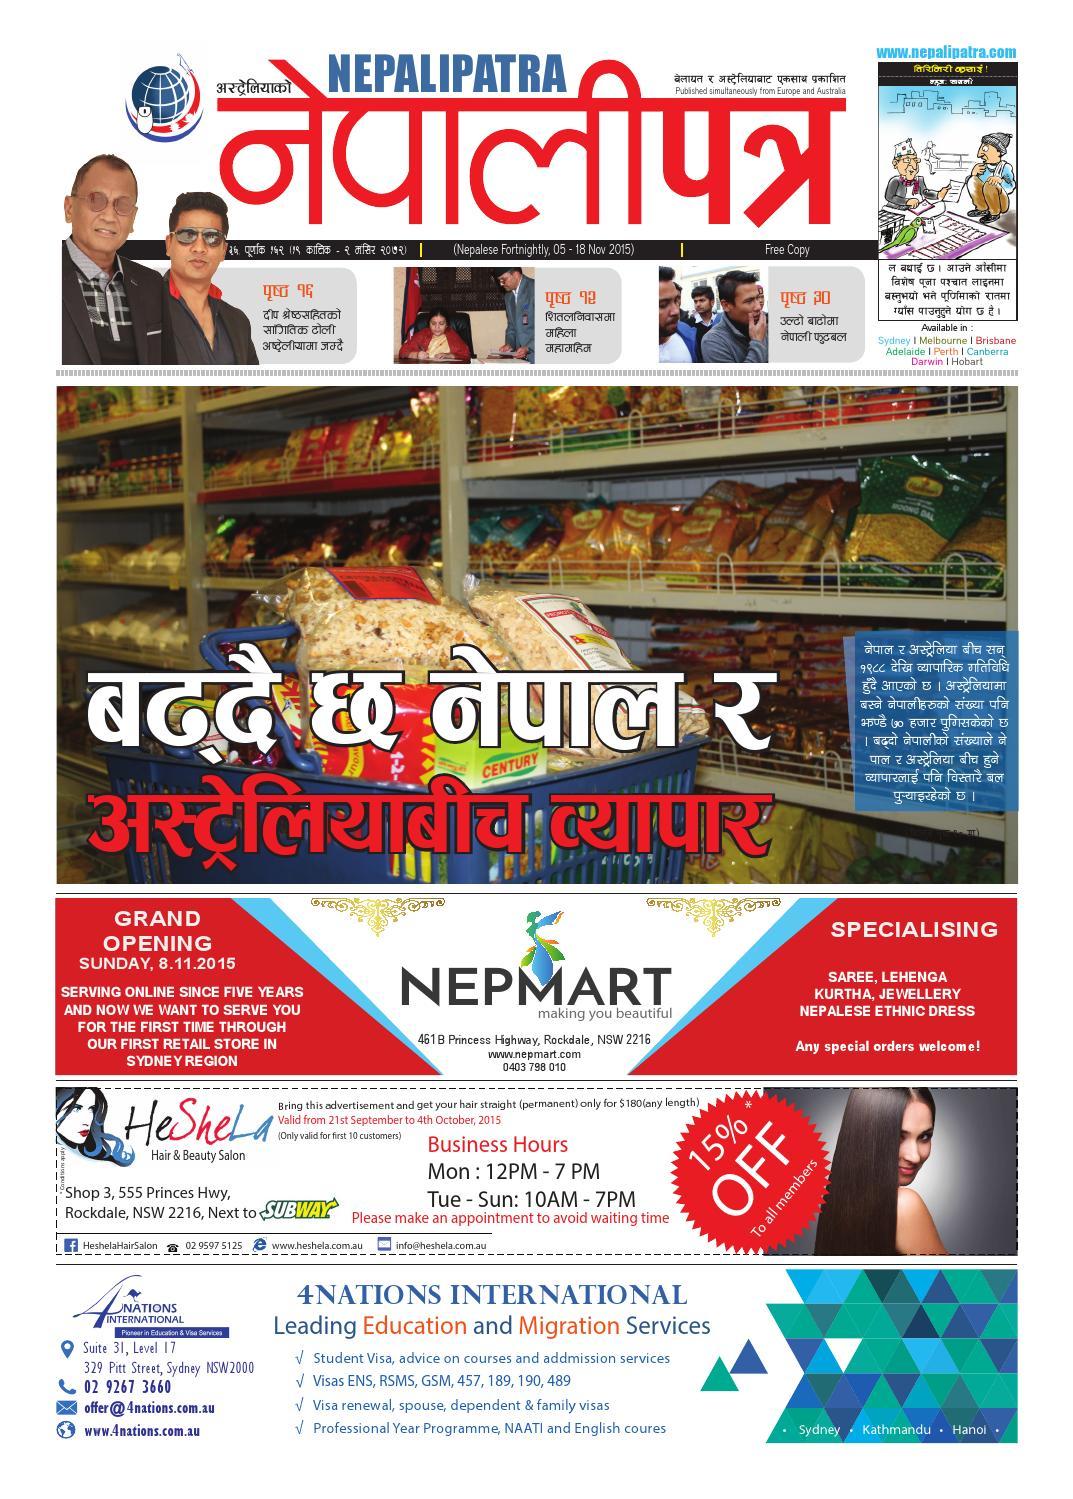 Australia Ko NepaliPatra Issue 162 by Global NepaliPatra Print